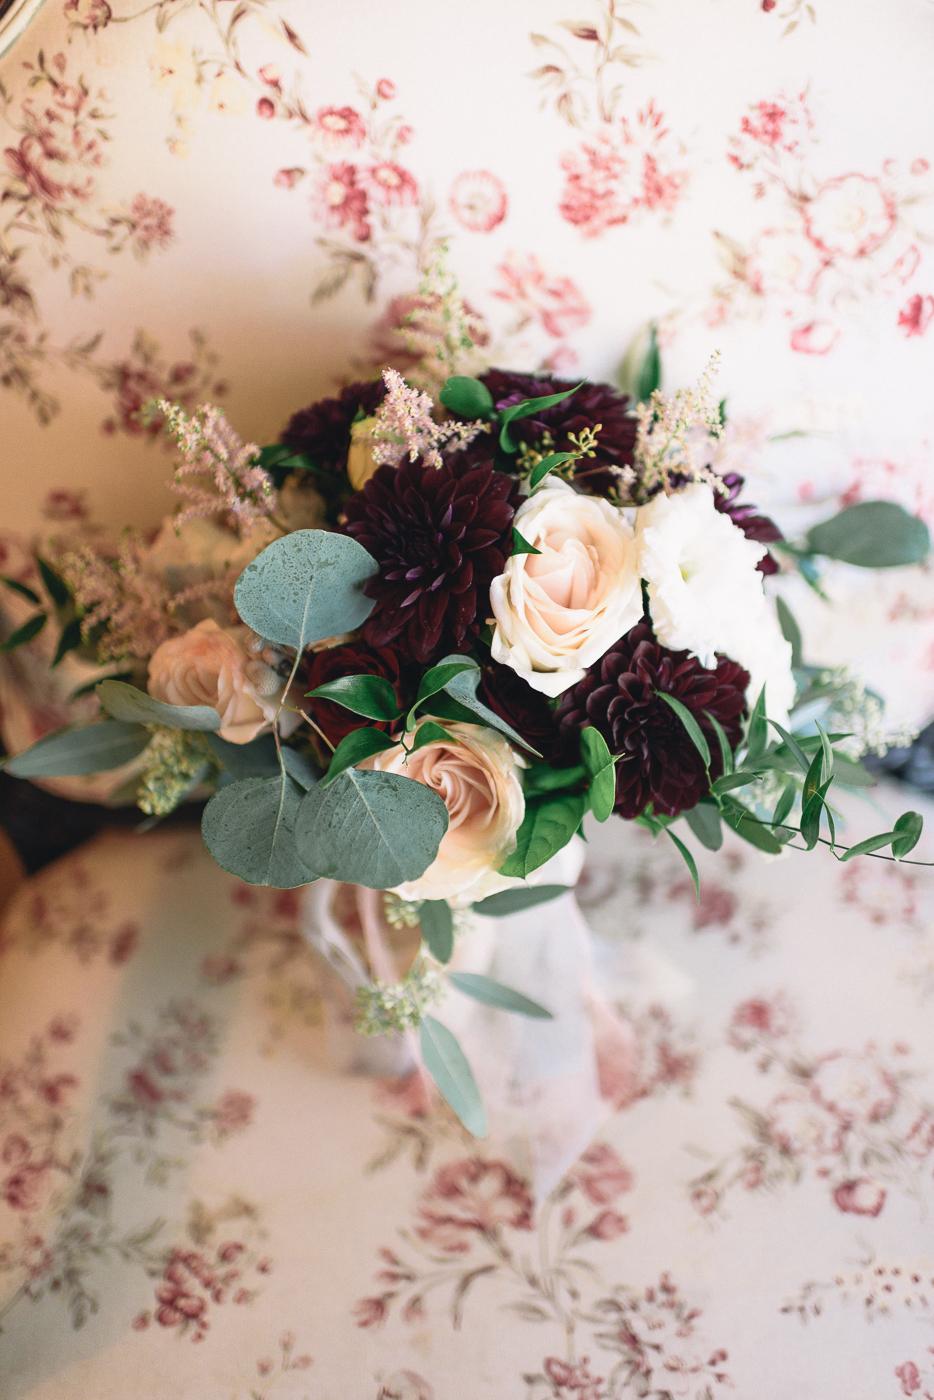 wedding flowers bouquet pink rose dahlias